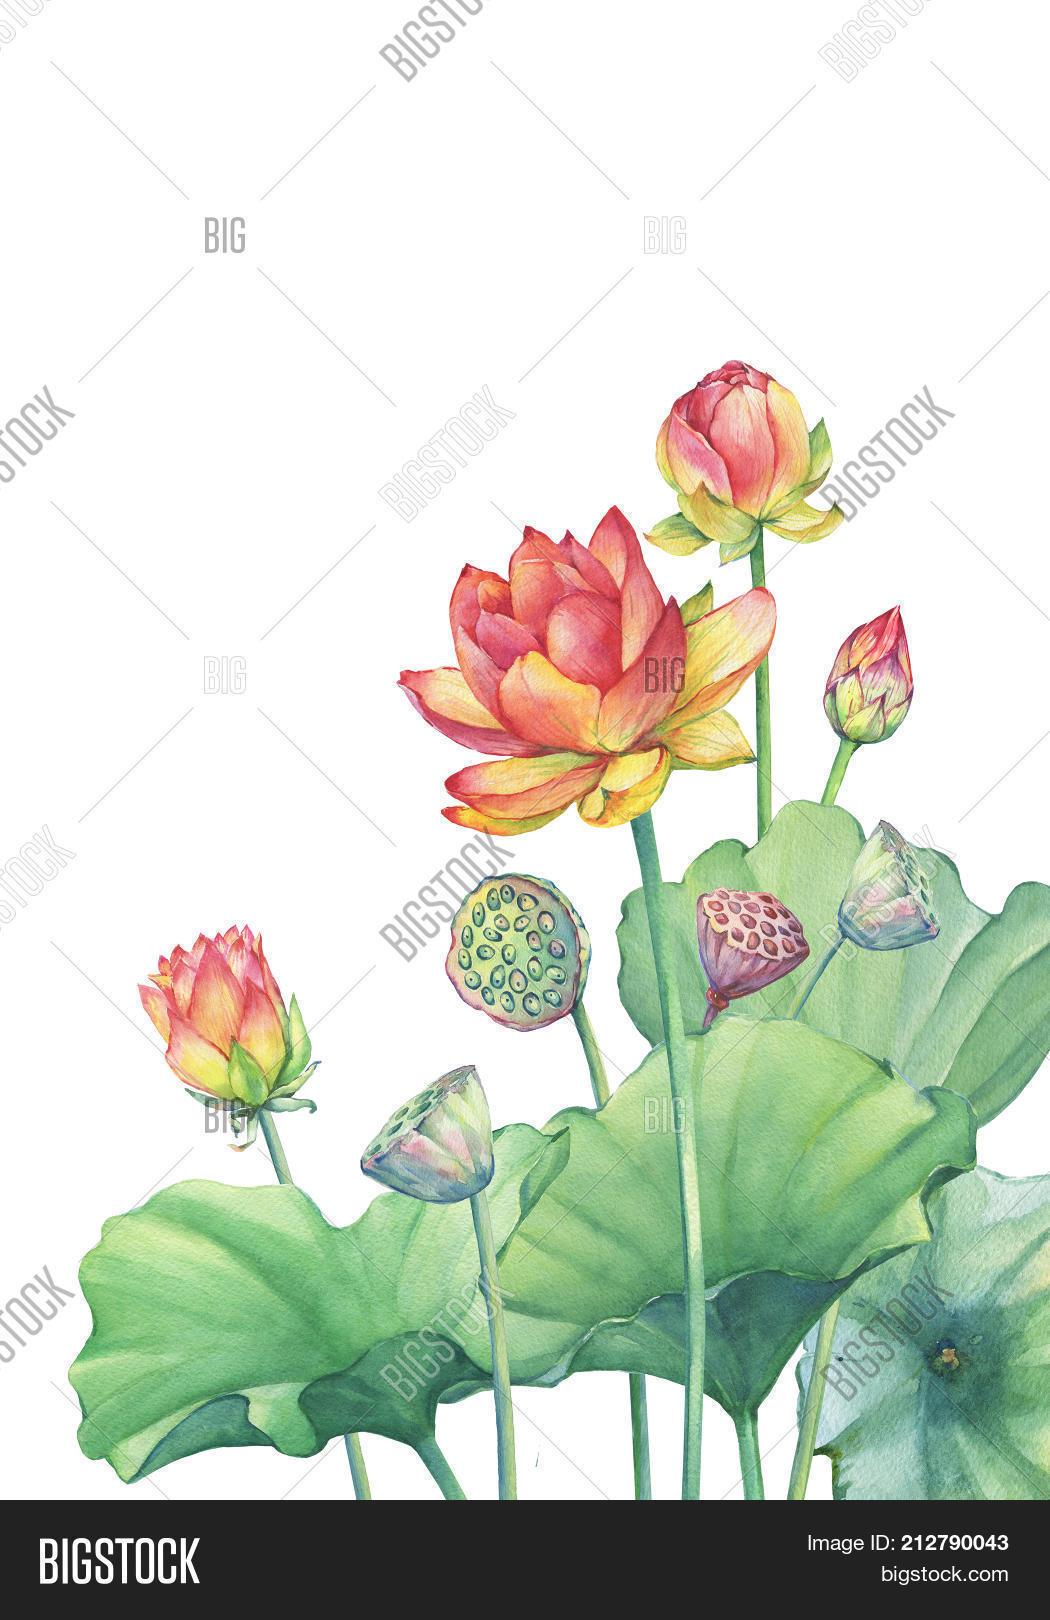 Banner border pink lotus flower image photo bigstock banner border of pink lotus flower with leaves seed head bud water izmirmasajfo